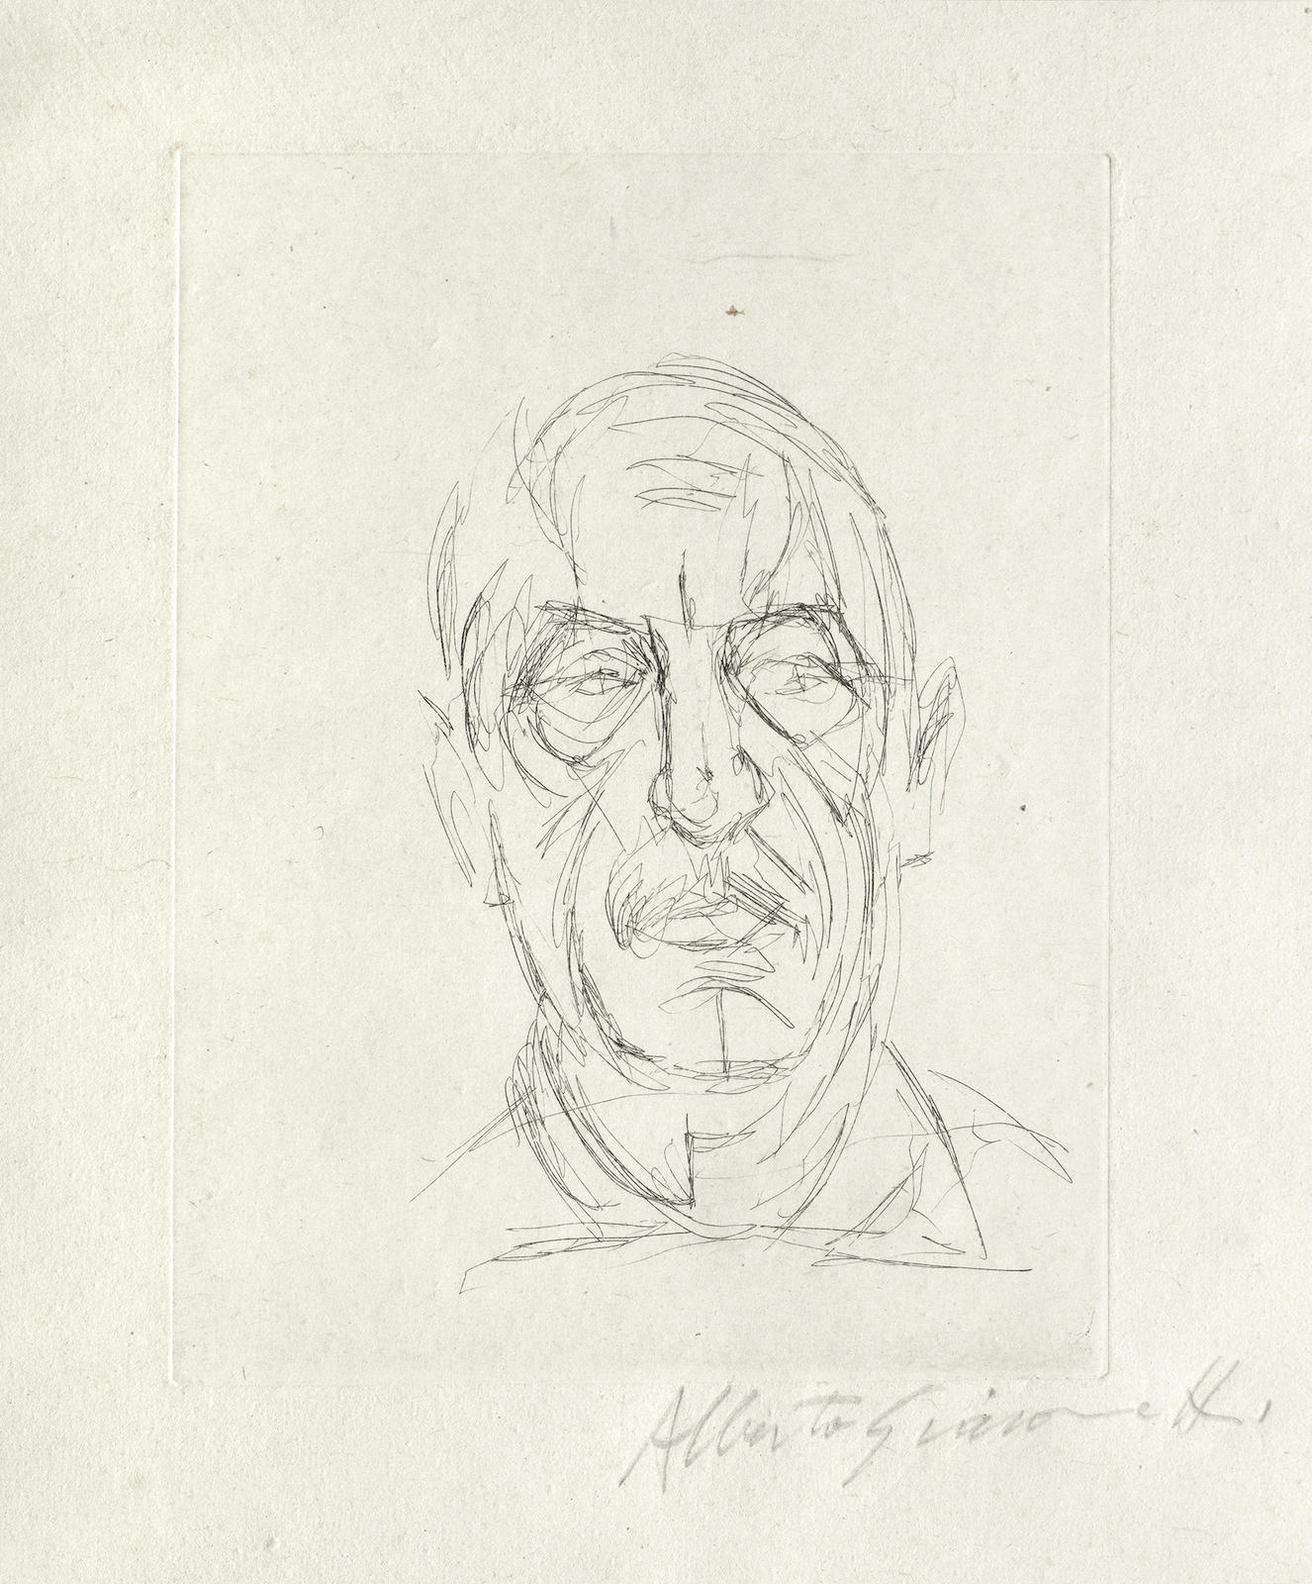 Alberto Giacometti-Portrait Du Poete Orbandale Vi, From Les Douze Portraits Du Celebre Orbandale (Kornfeld 353; Lust 167)-1961